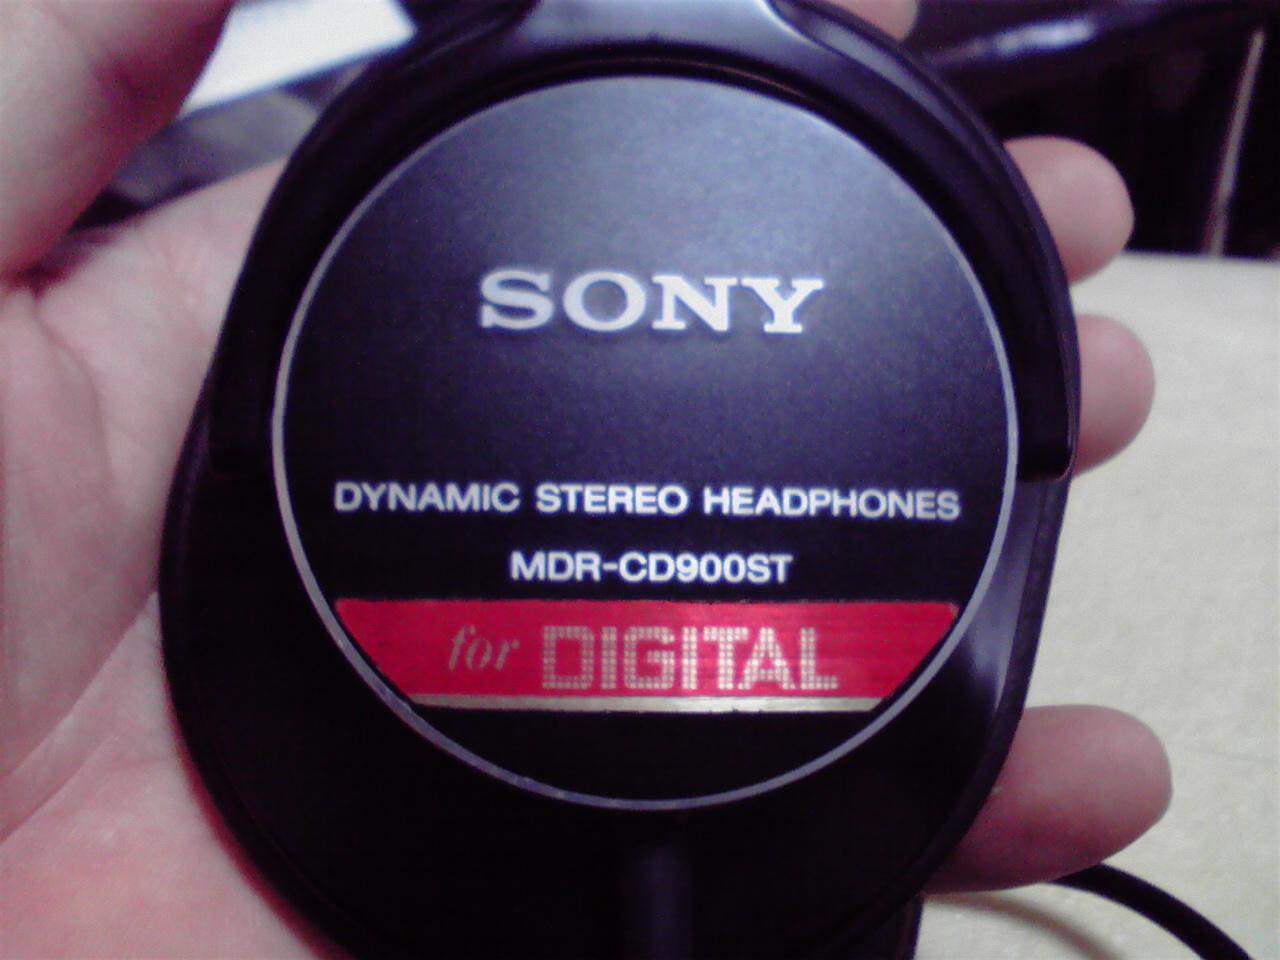 MDR-CD900ST 01